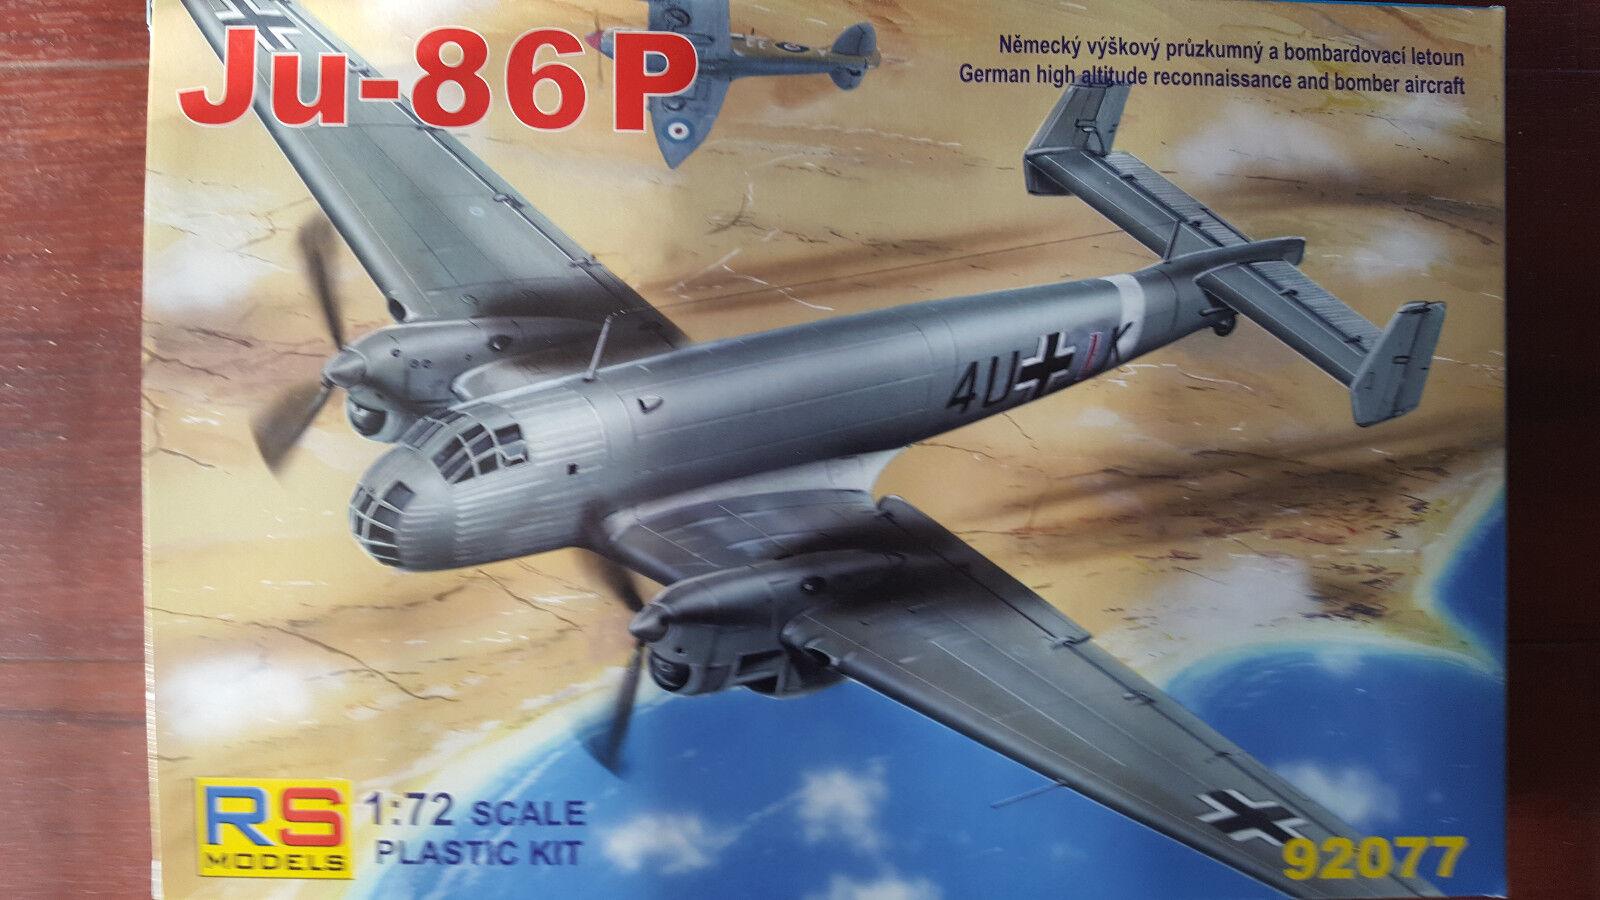 Ju-86P GERMAN RECO. MEDIUM BOMBER WWII RS MODELS 1 72 PLASTIC KIT